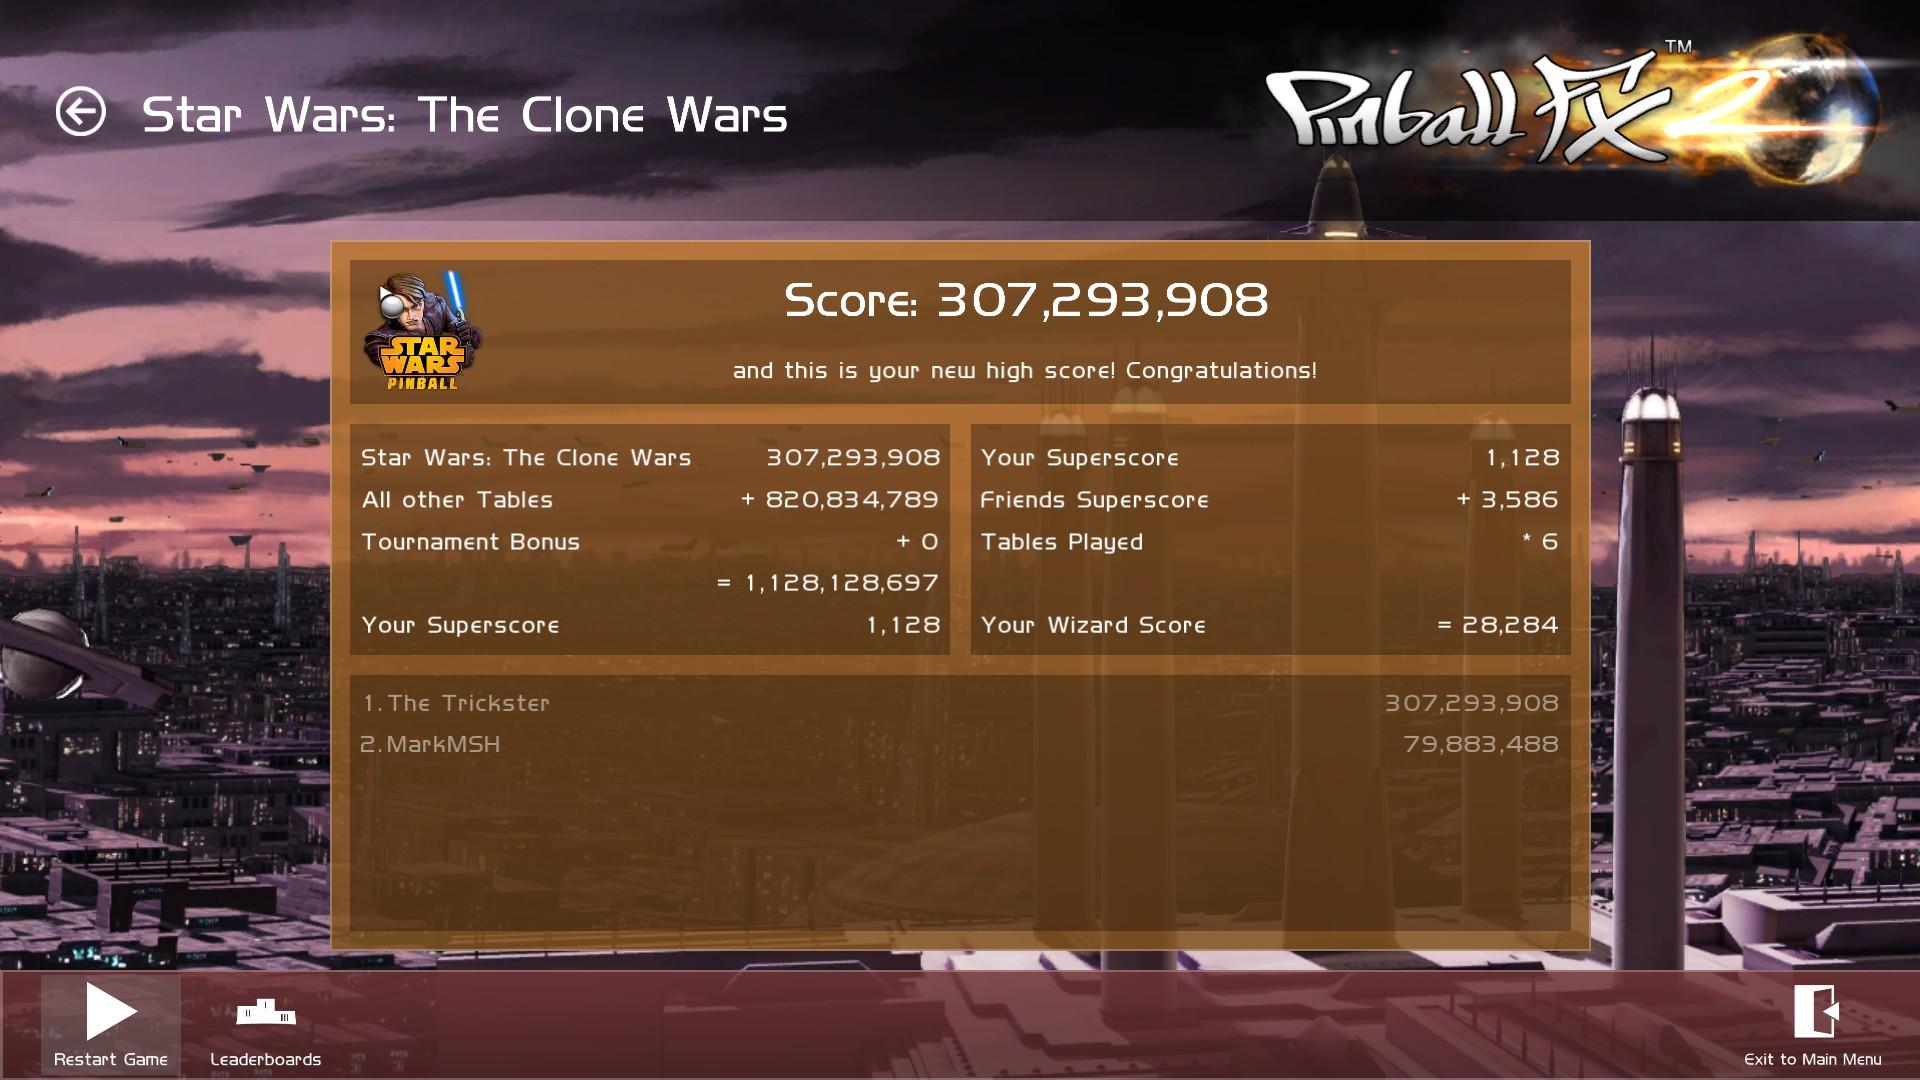 Pinball FX 2: Star Wars: The Clone Wars 307,293,908 points